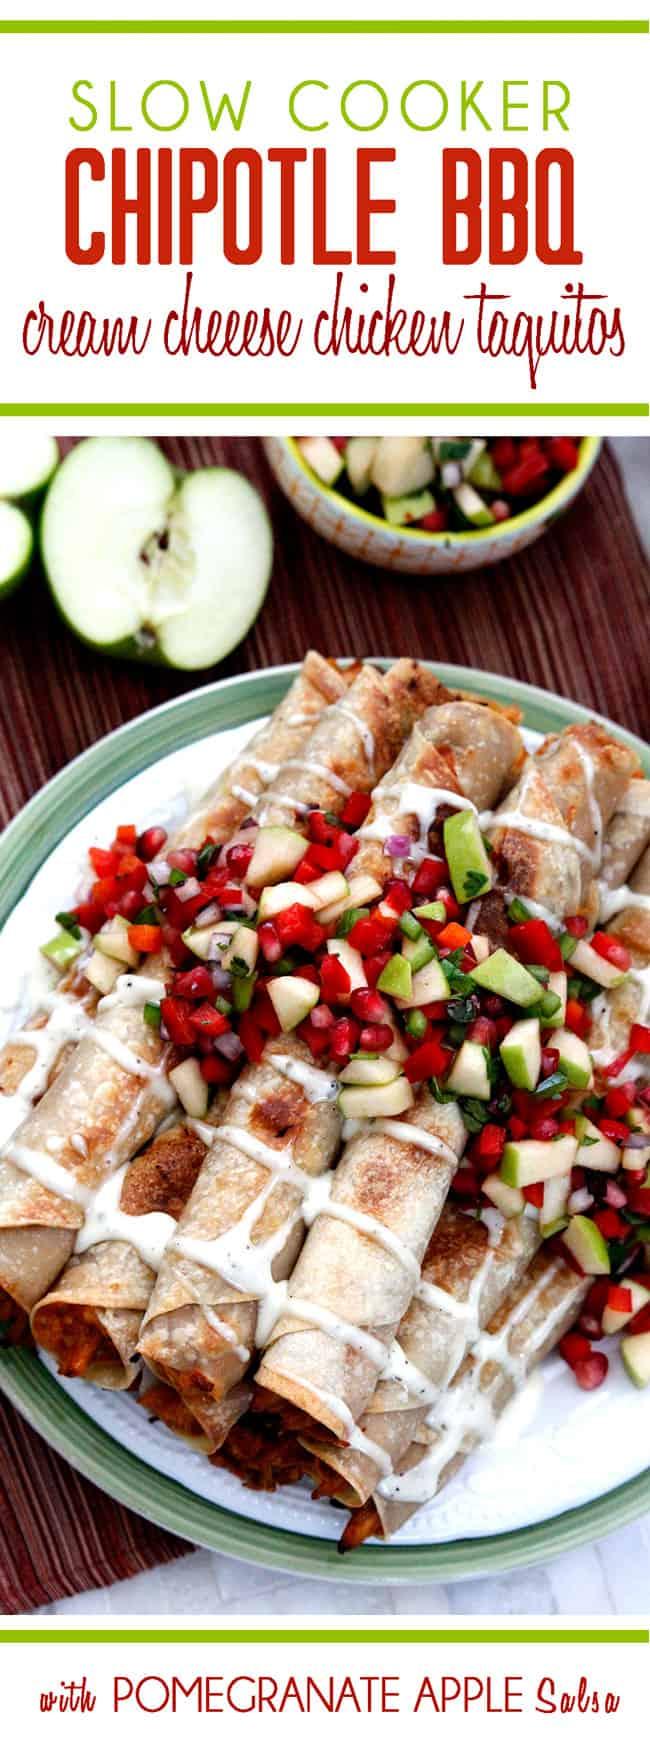 BBQ-Raspberry-Chipotle-Chicken-Taquitos-main4